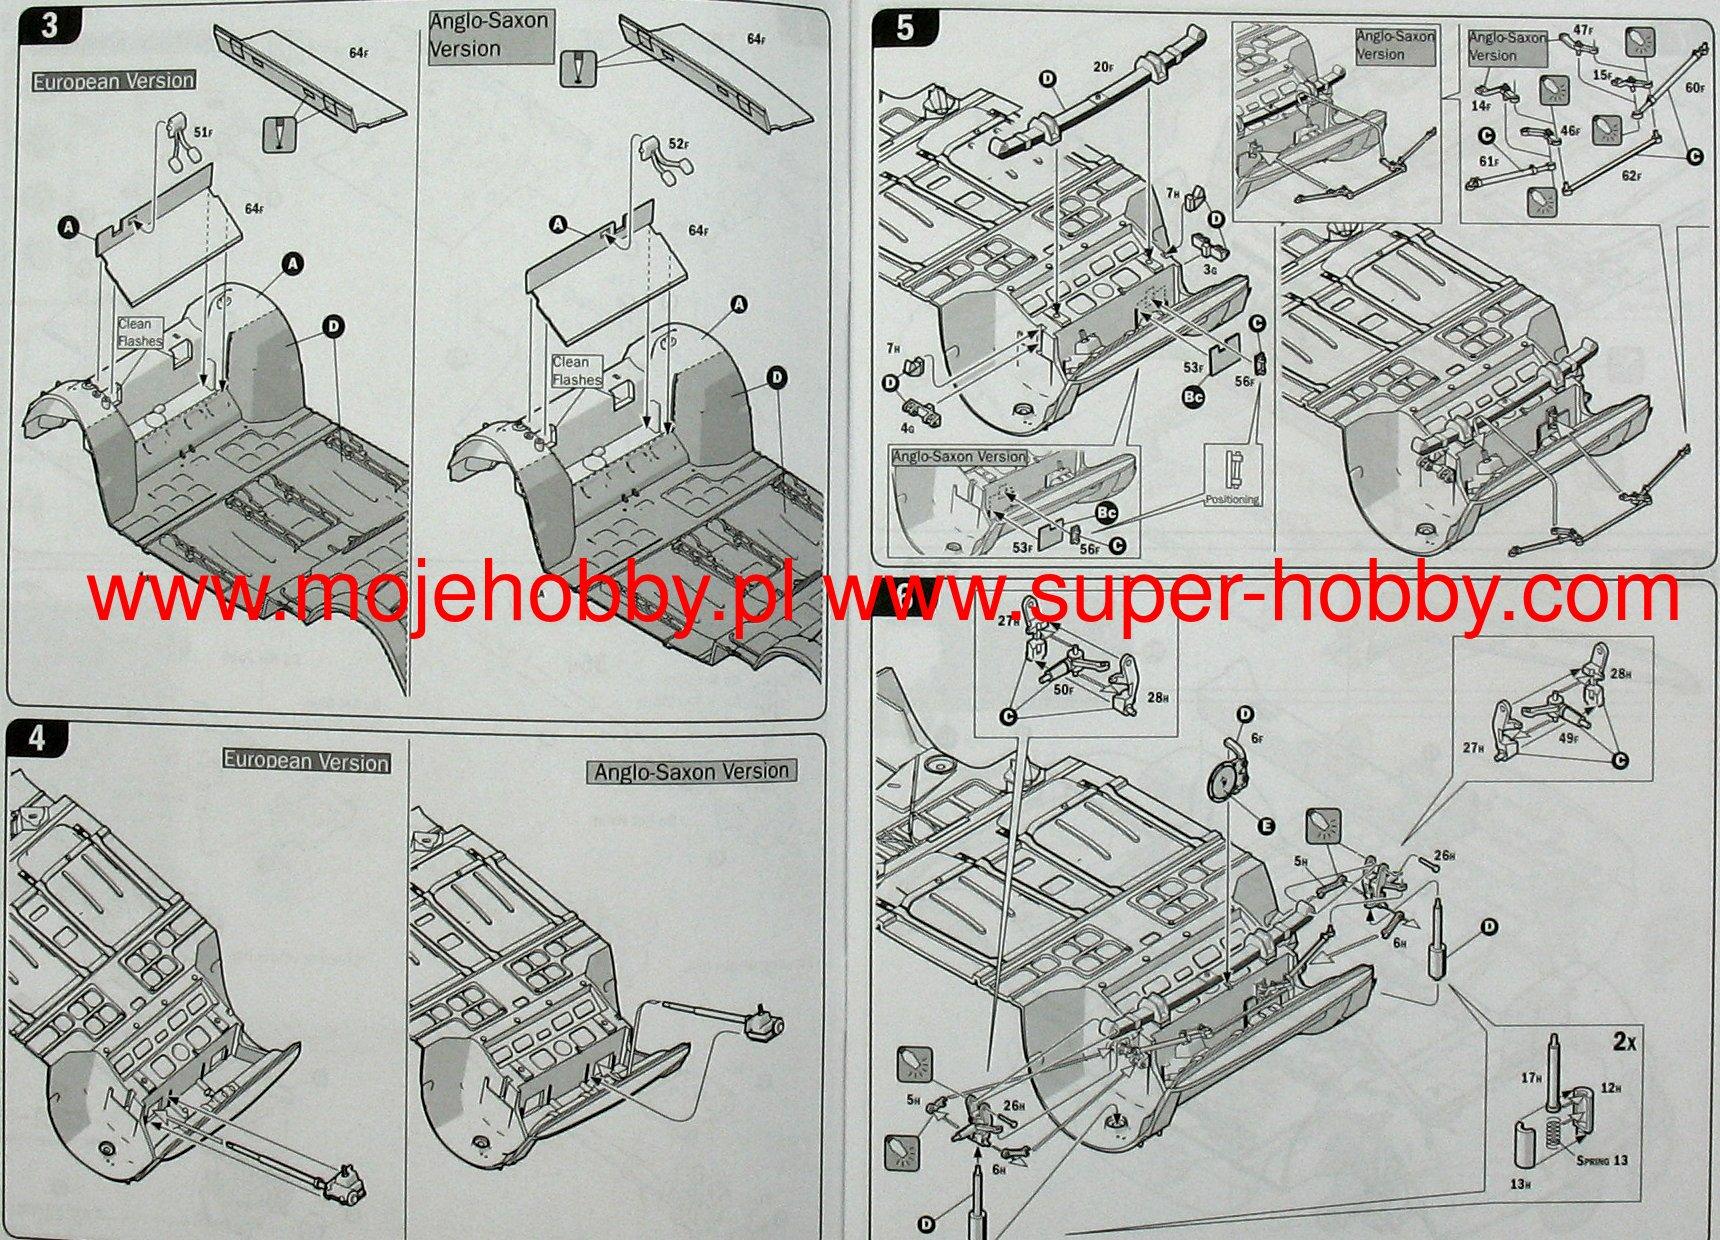 hight resolution of 1973 fiat 1300 wiring diagram electrical wiring diagrams spider fiat wire harness fiat 640 wiring diagram